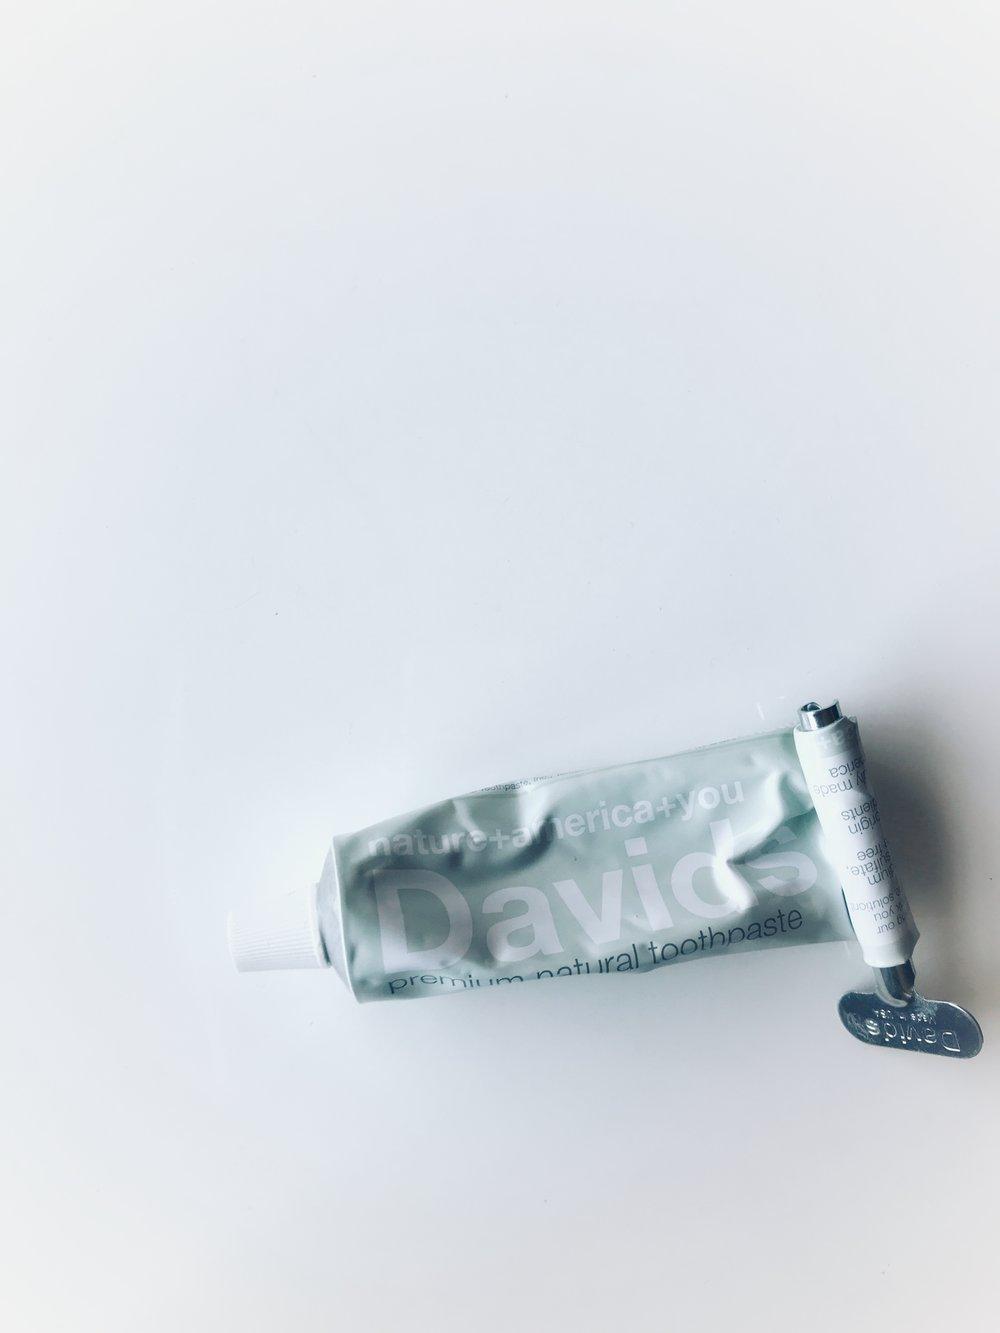 David's flouride-free toothpaste